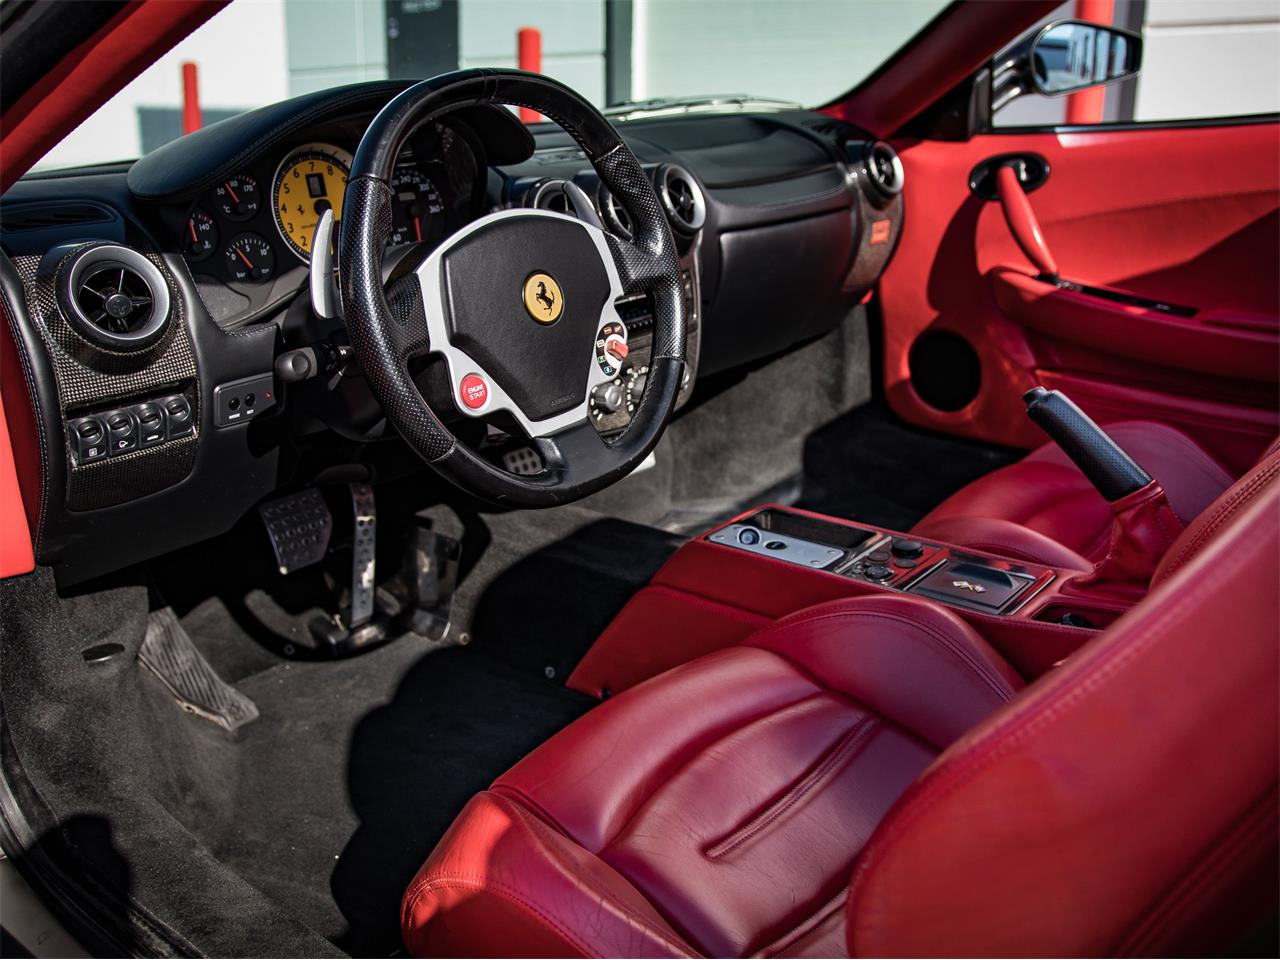 2006 Ferrari F430 (CC-1337215) for sale in Kelowna, British Columbia